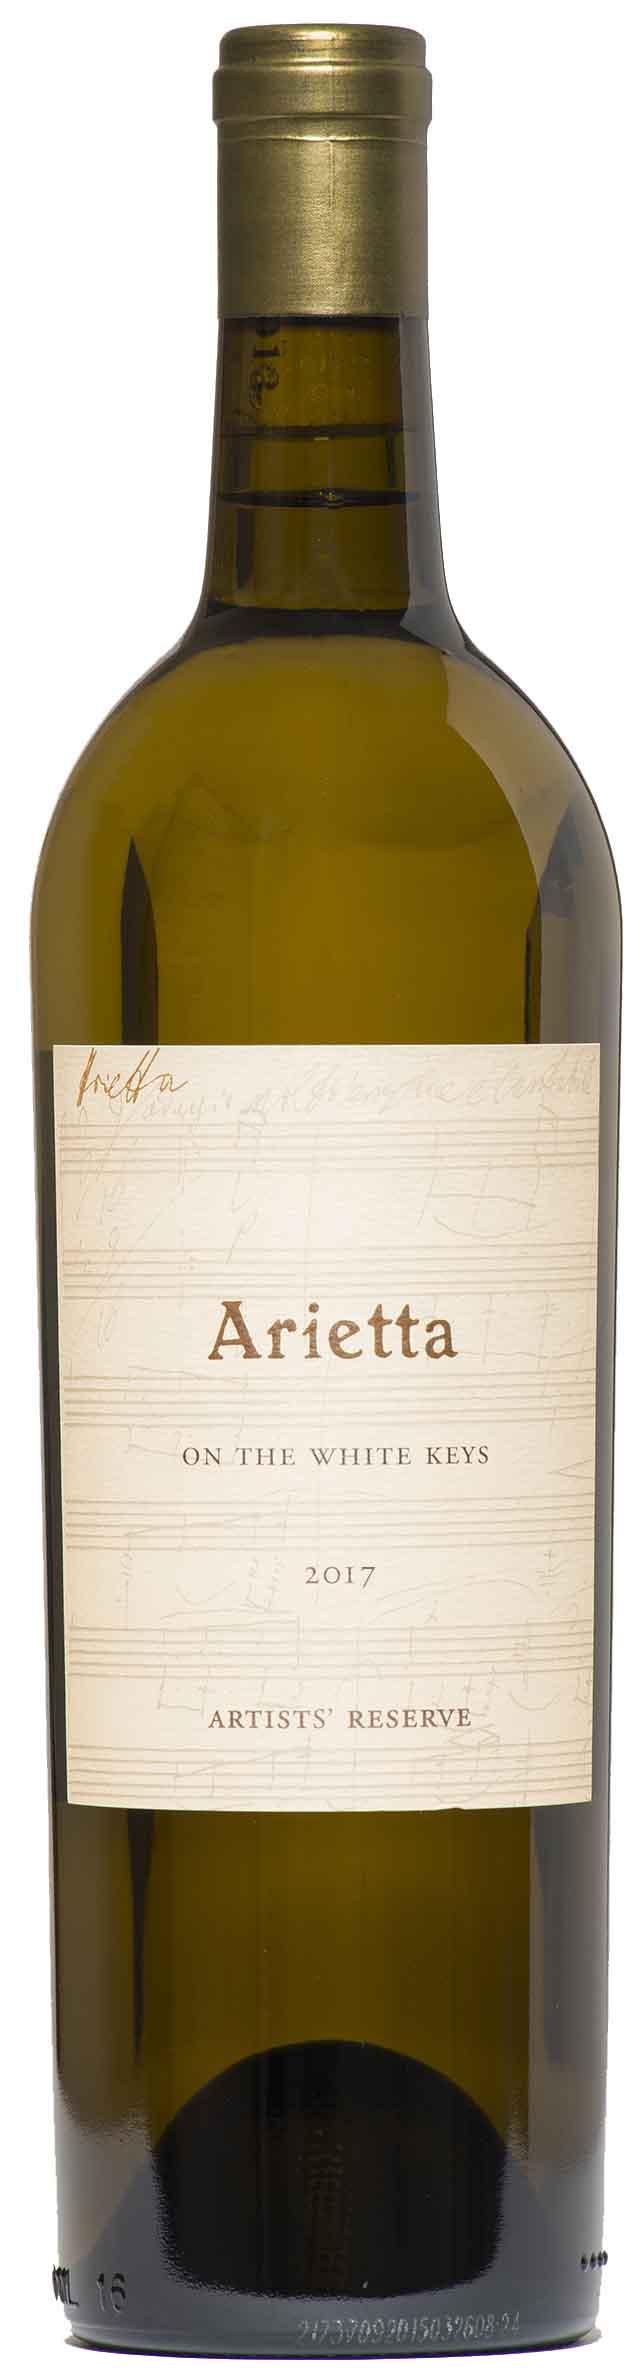 2017 Arietta Artists Reserve